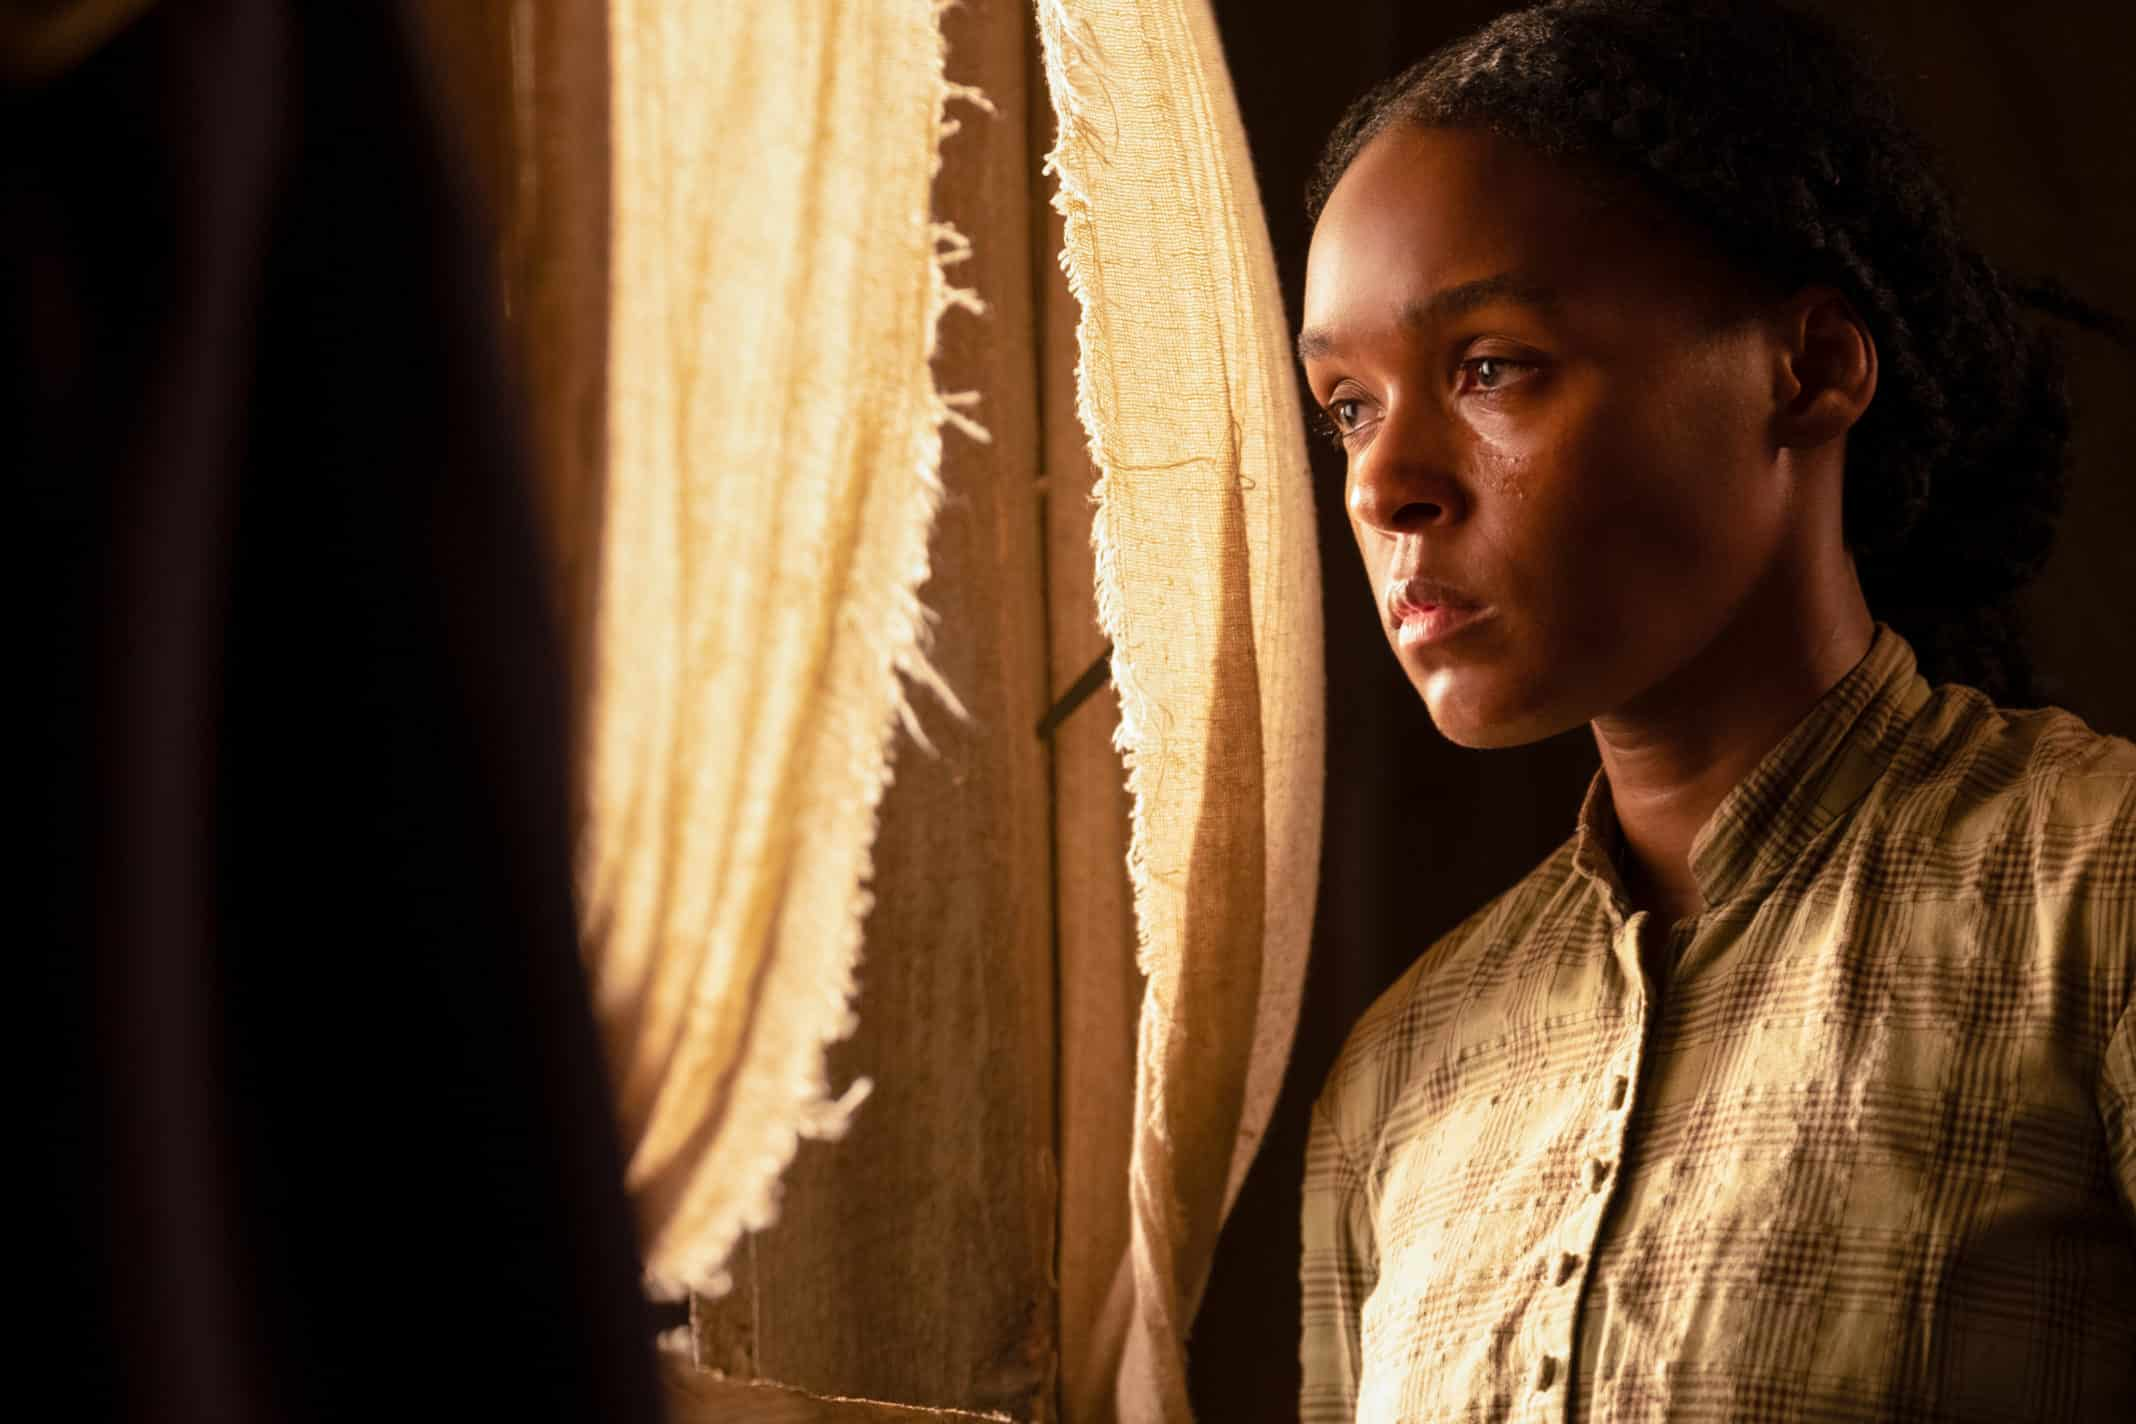 Janelle Monae as Eden looking out a window.